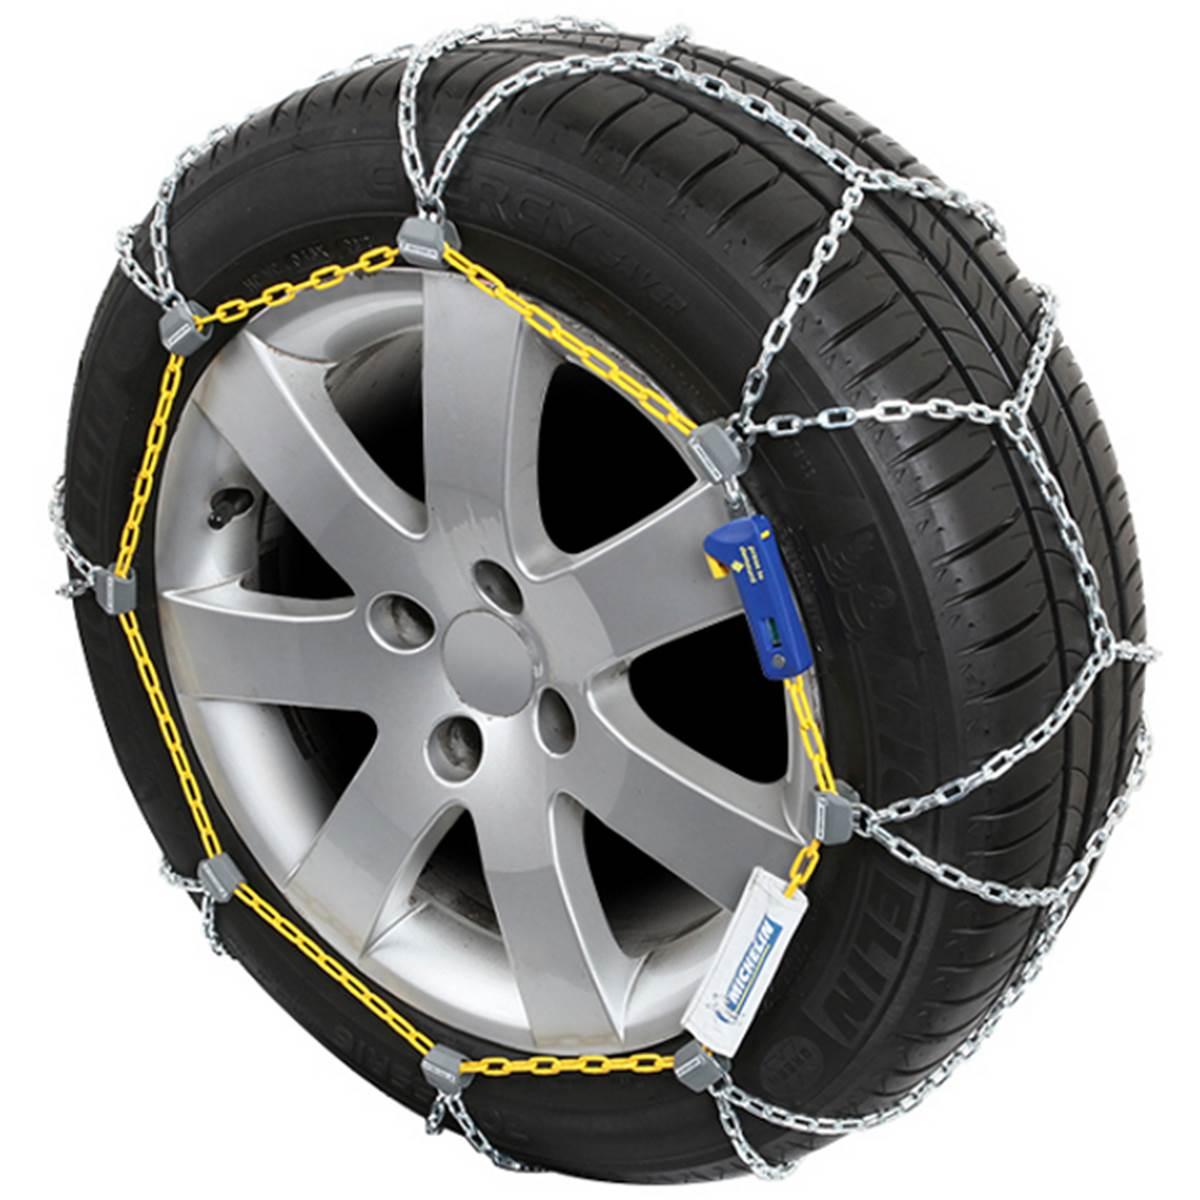 2 Chaînes neige Michelin elastic Chain MI20